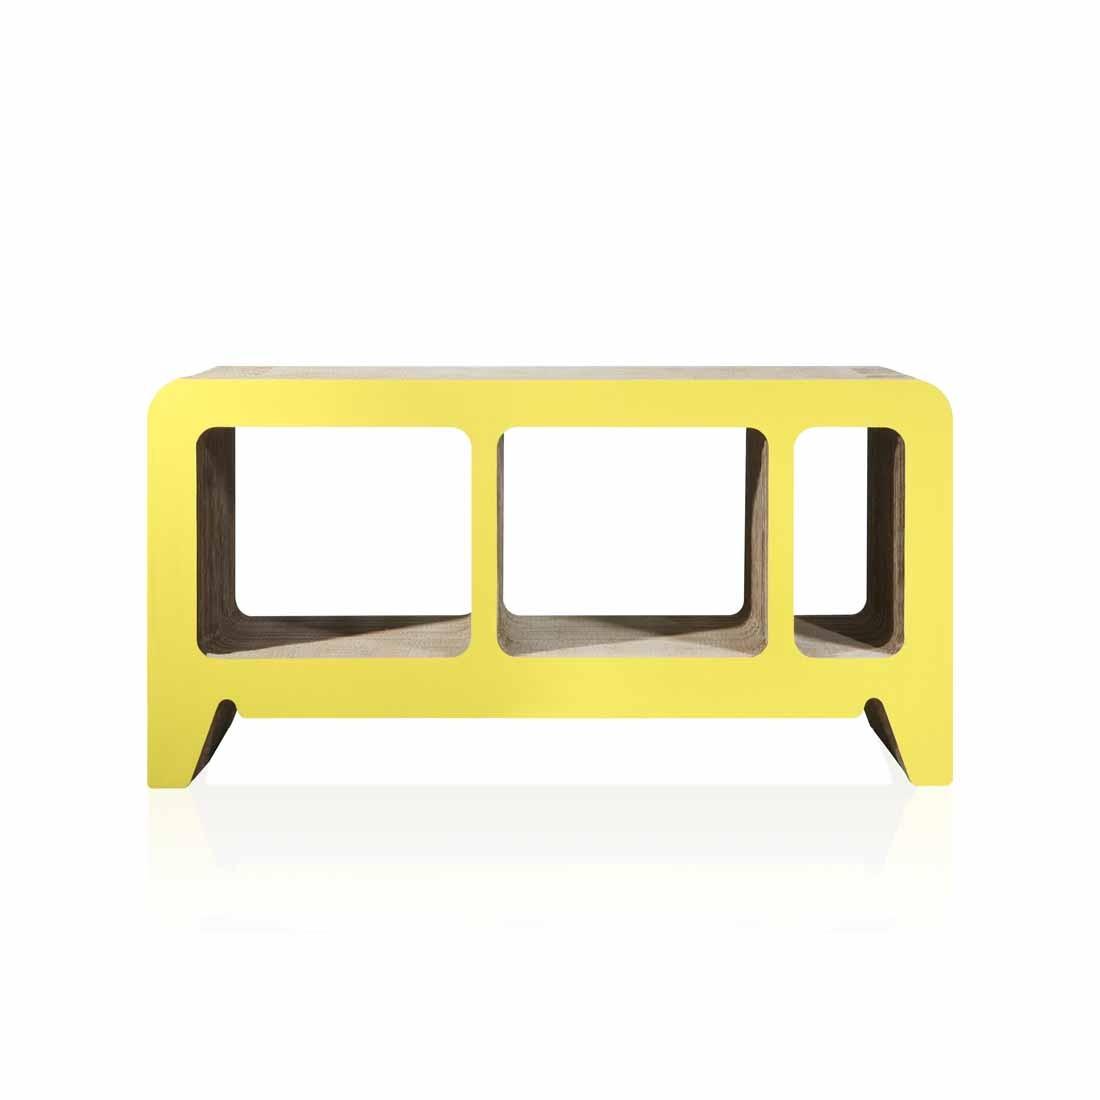 design modern cardboard furniture. cardboard bookshelvescardboard furniturecardboard sideboardcontemporary bookshelvescool sideboardscreative design modern furniture e